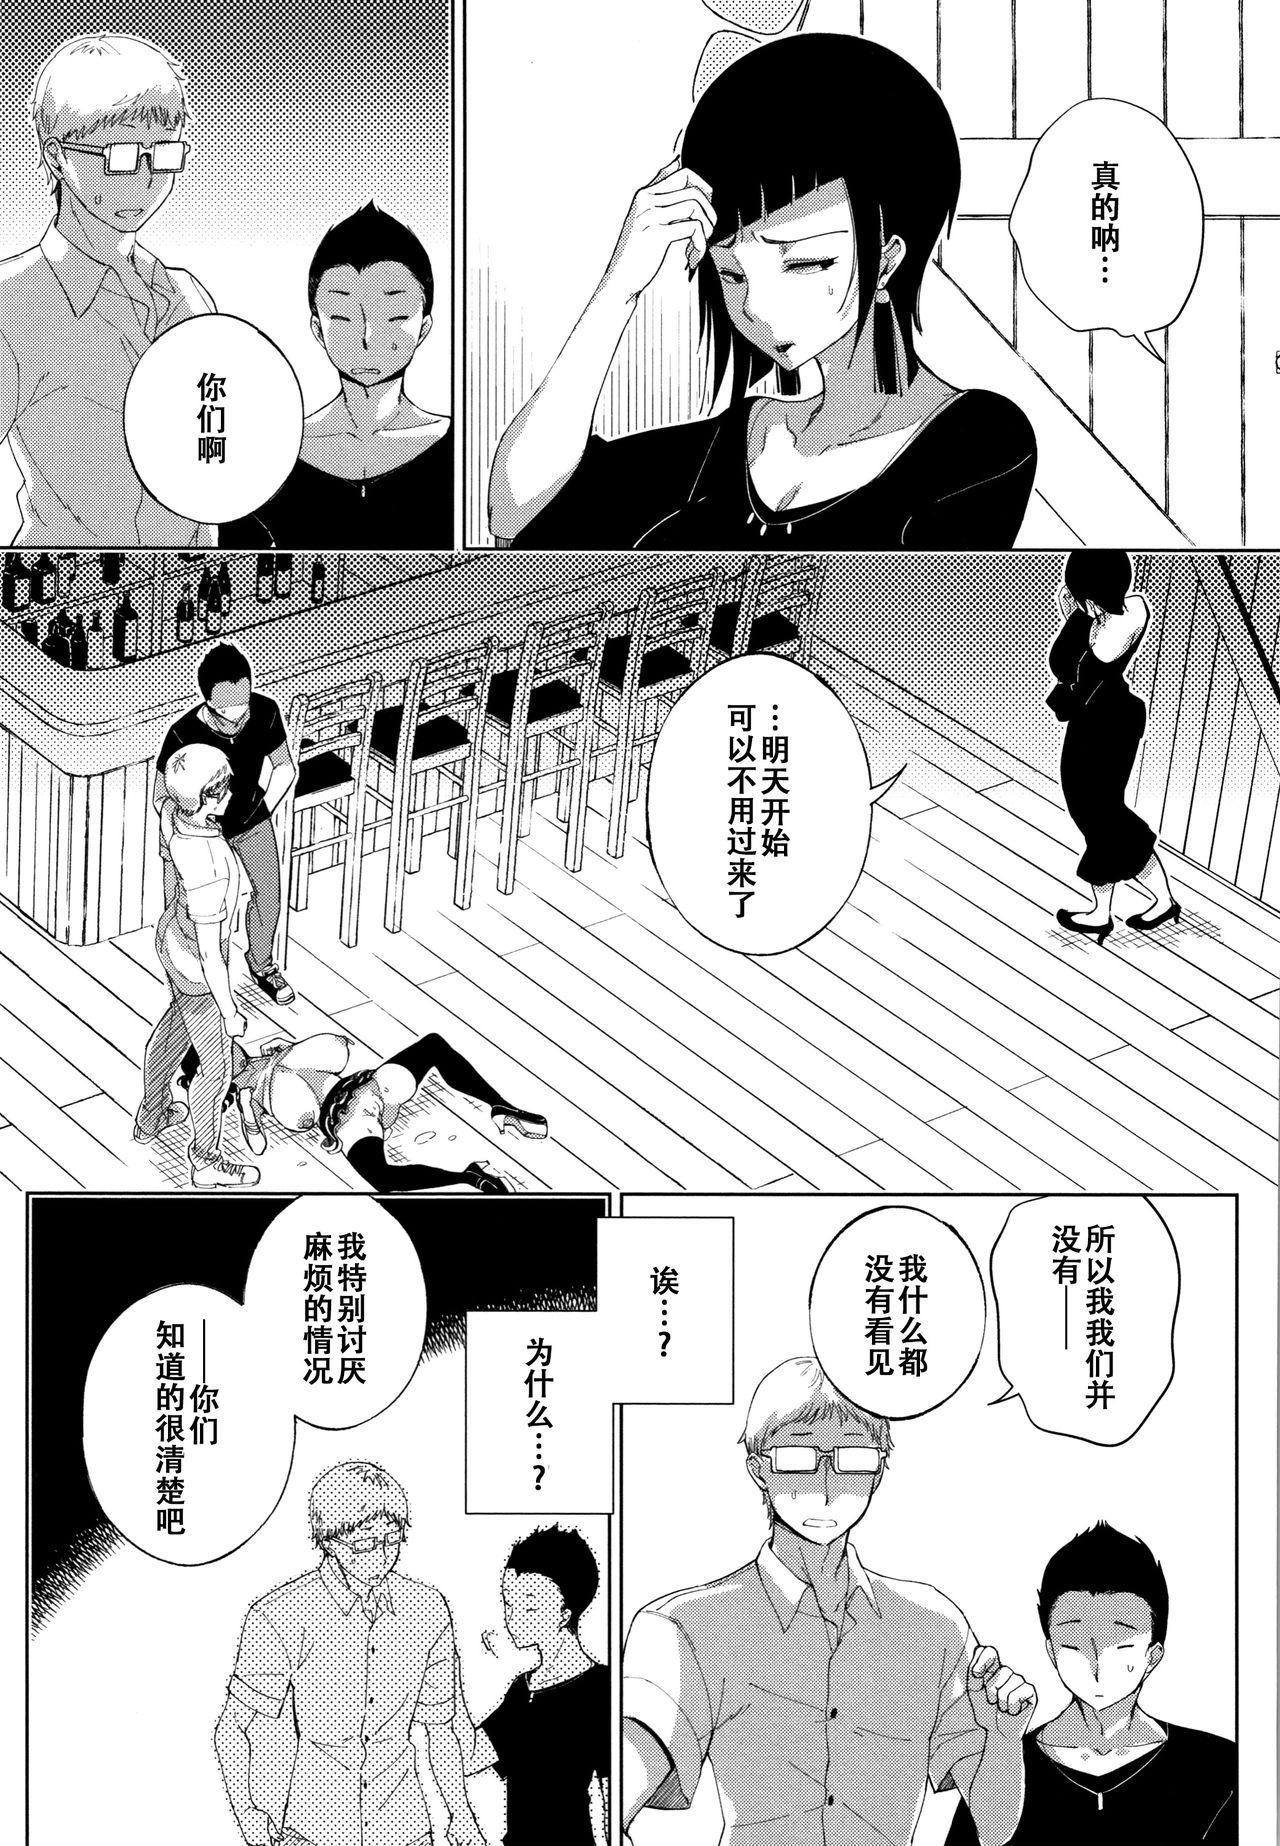 [Achumuchi] Saijaku Gal wa Ikizurai! - The weakest pussy is hard to go.ch.1-8 [Chinese] [战栗的玻璃棒汉化] [Ongoing] 51